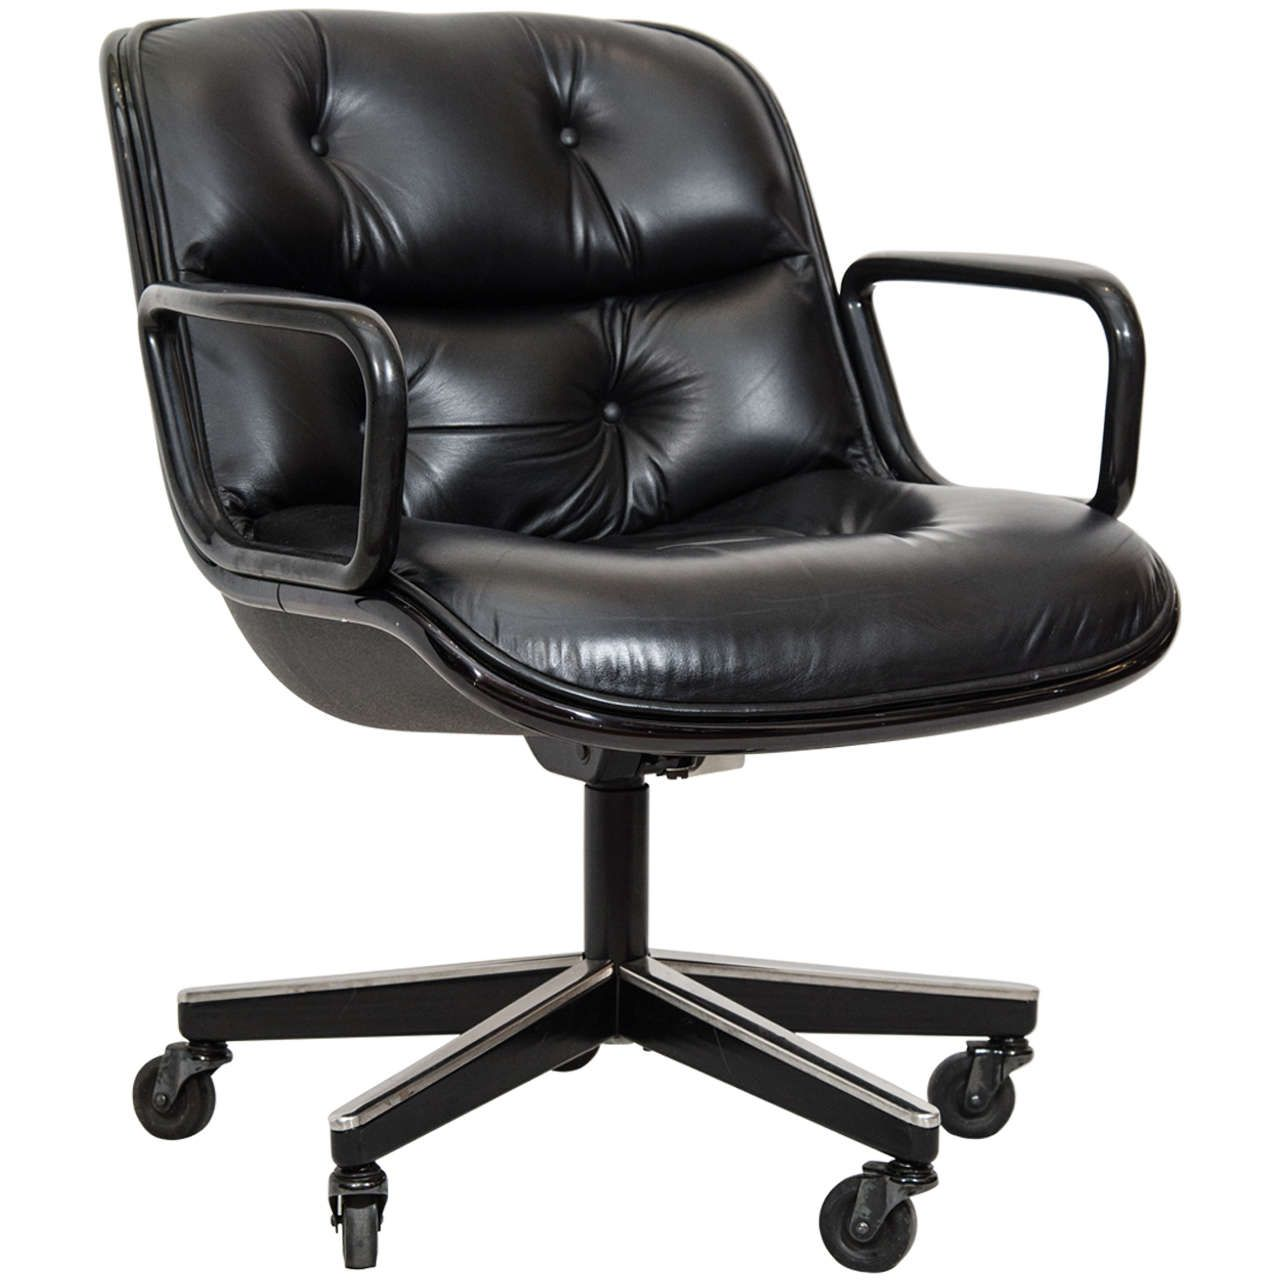 Charles Pollock Executive Desk Chair For Knoll Desks Office